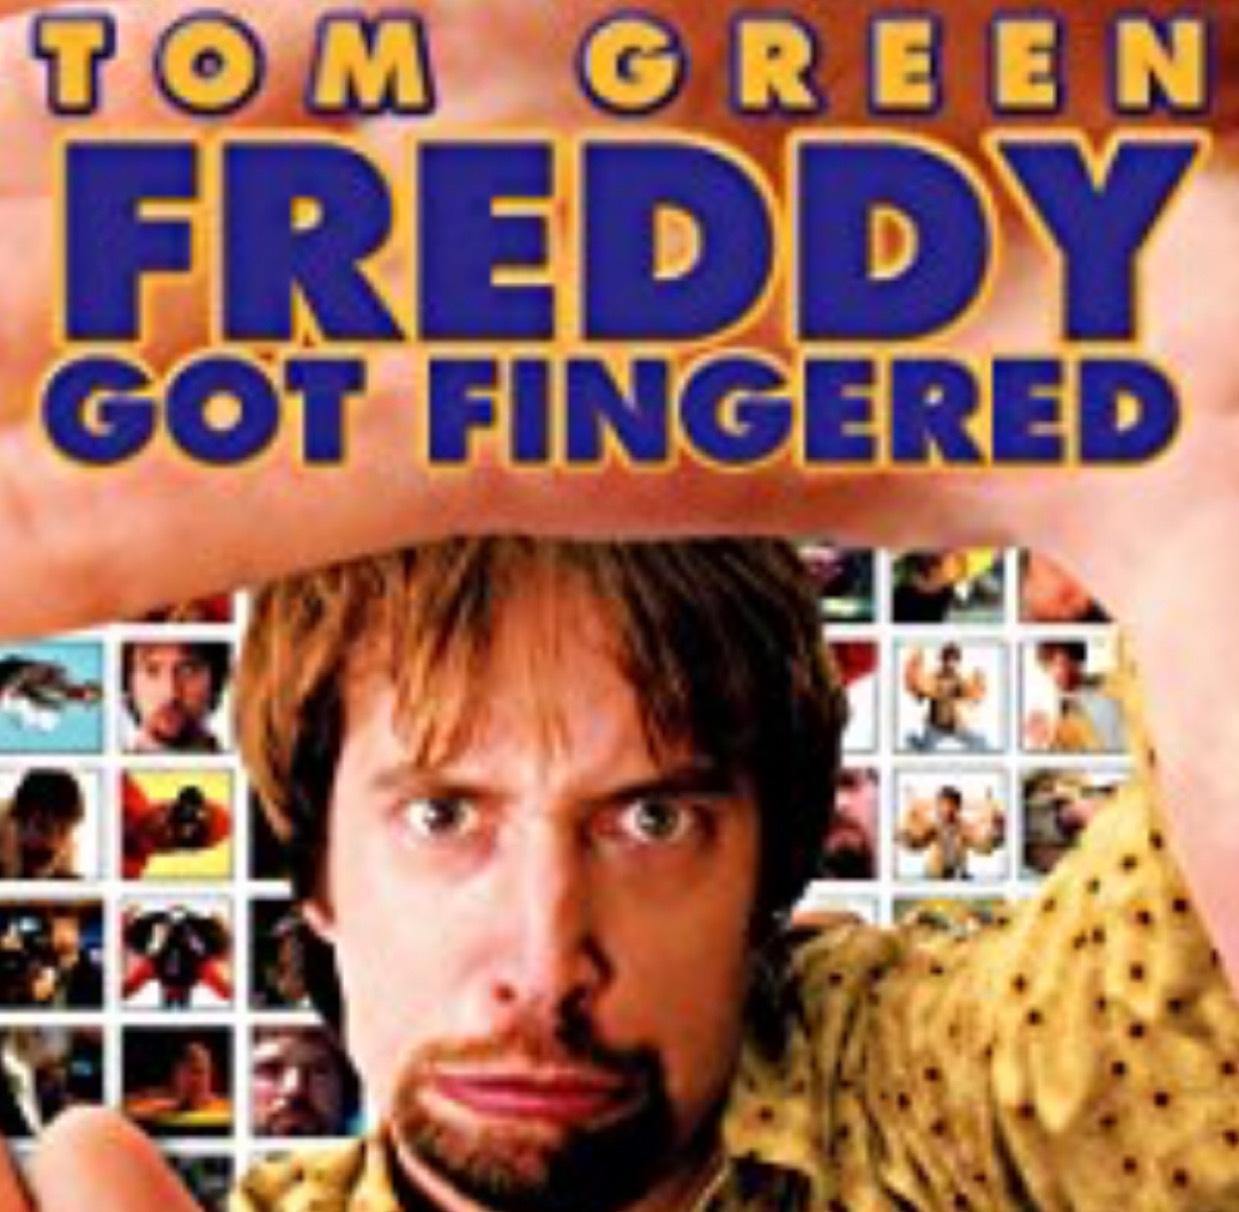 Freddy Got Fingered HD £2.49 @ Amazon Video